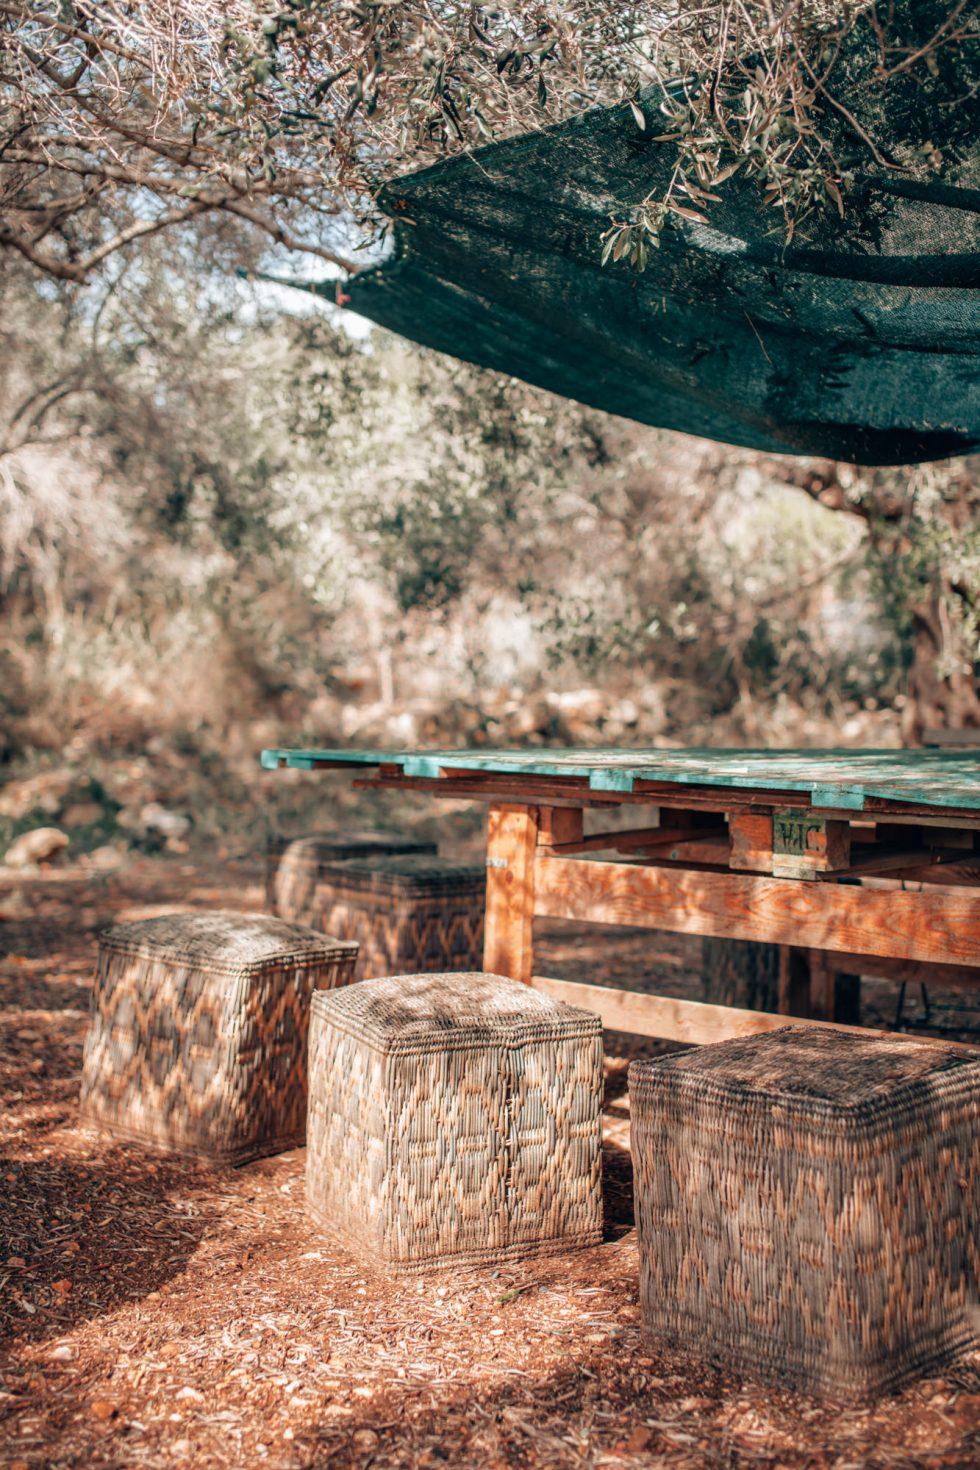 malta-travel-lifestyle-photographer-laura-g-diaz-8